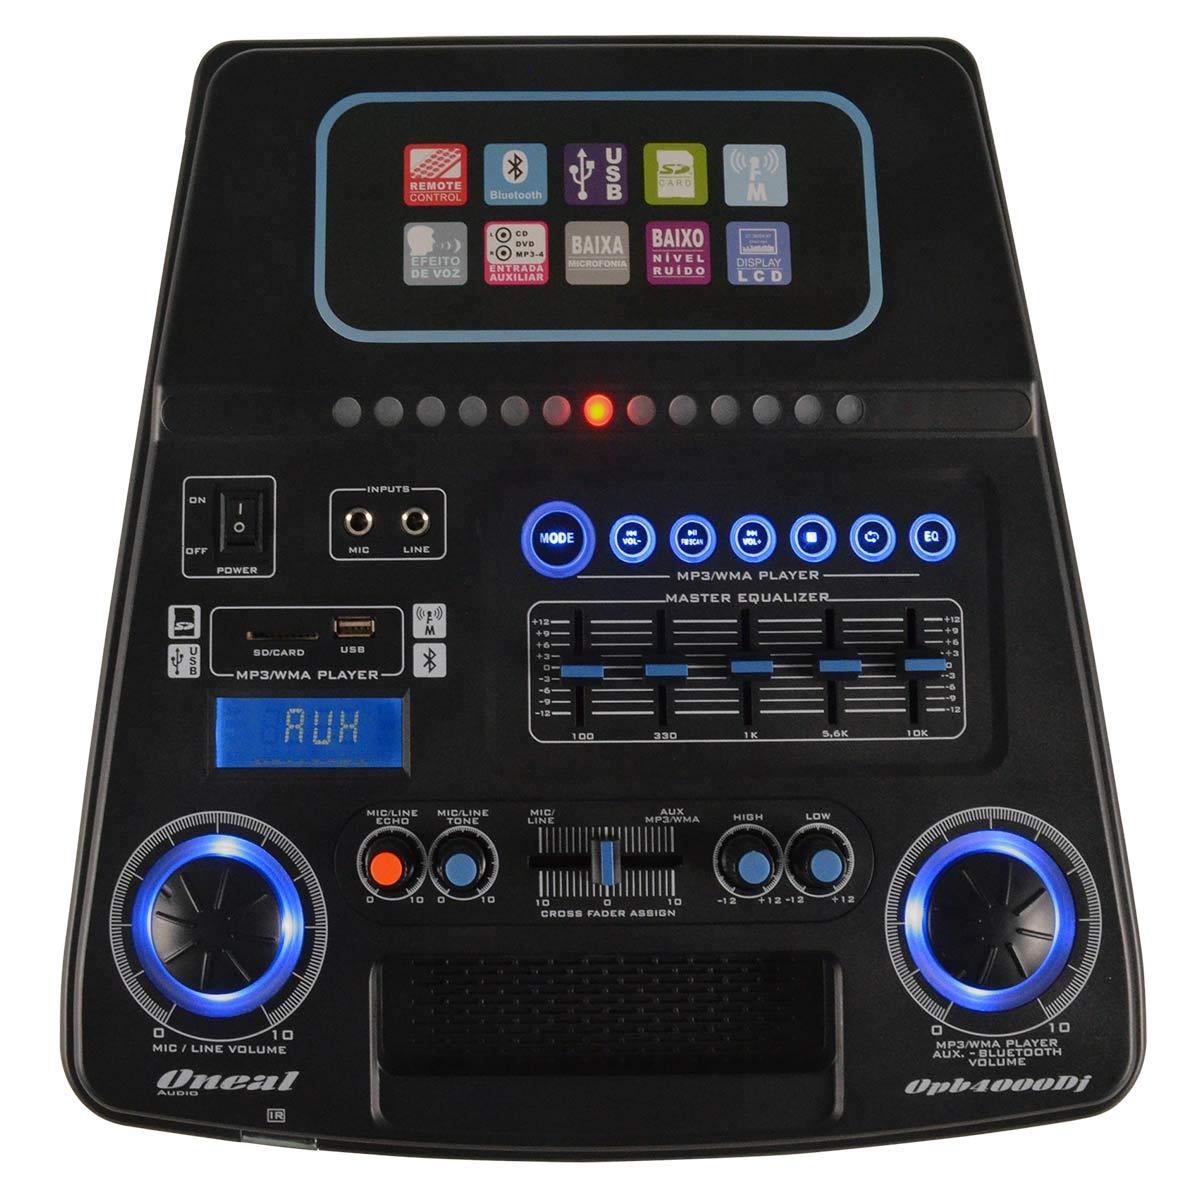 OPB4000DJ - Caixa Ativa c/ Microfone s/ Fio / Bluetooth e USB 1200W OPB 4000 DJ - Oneal